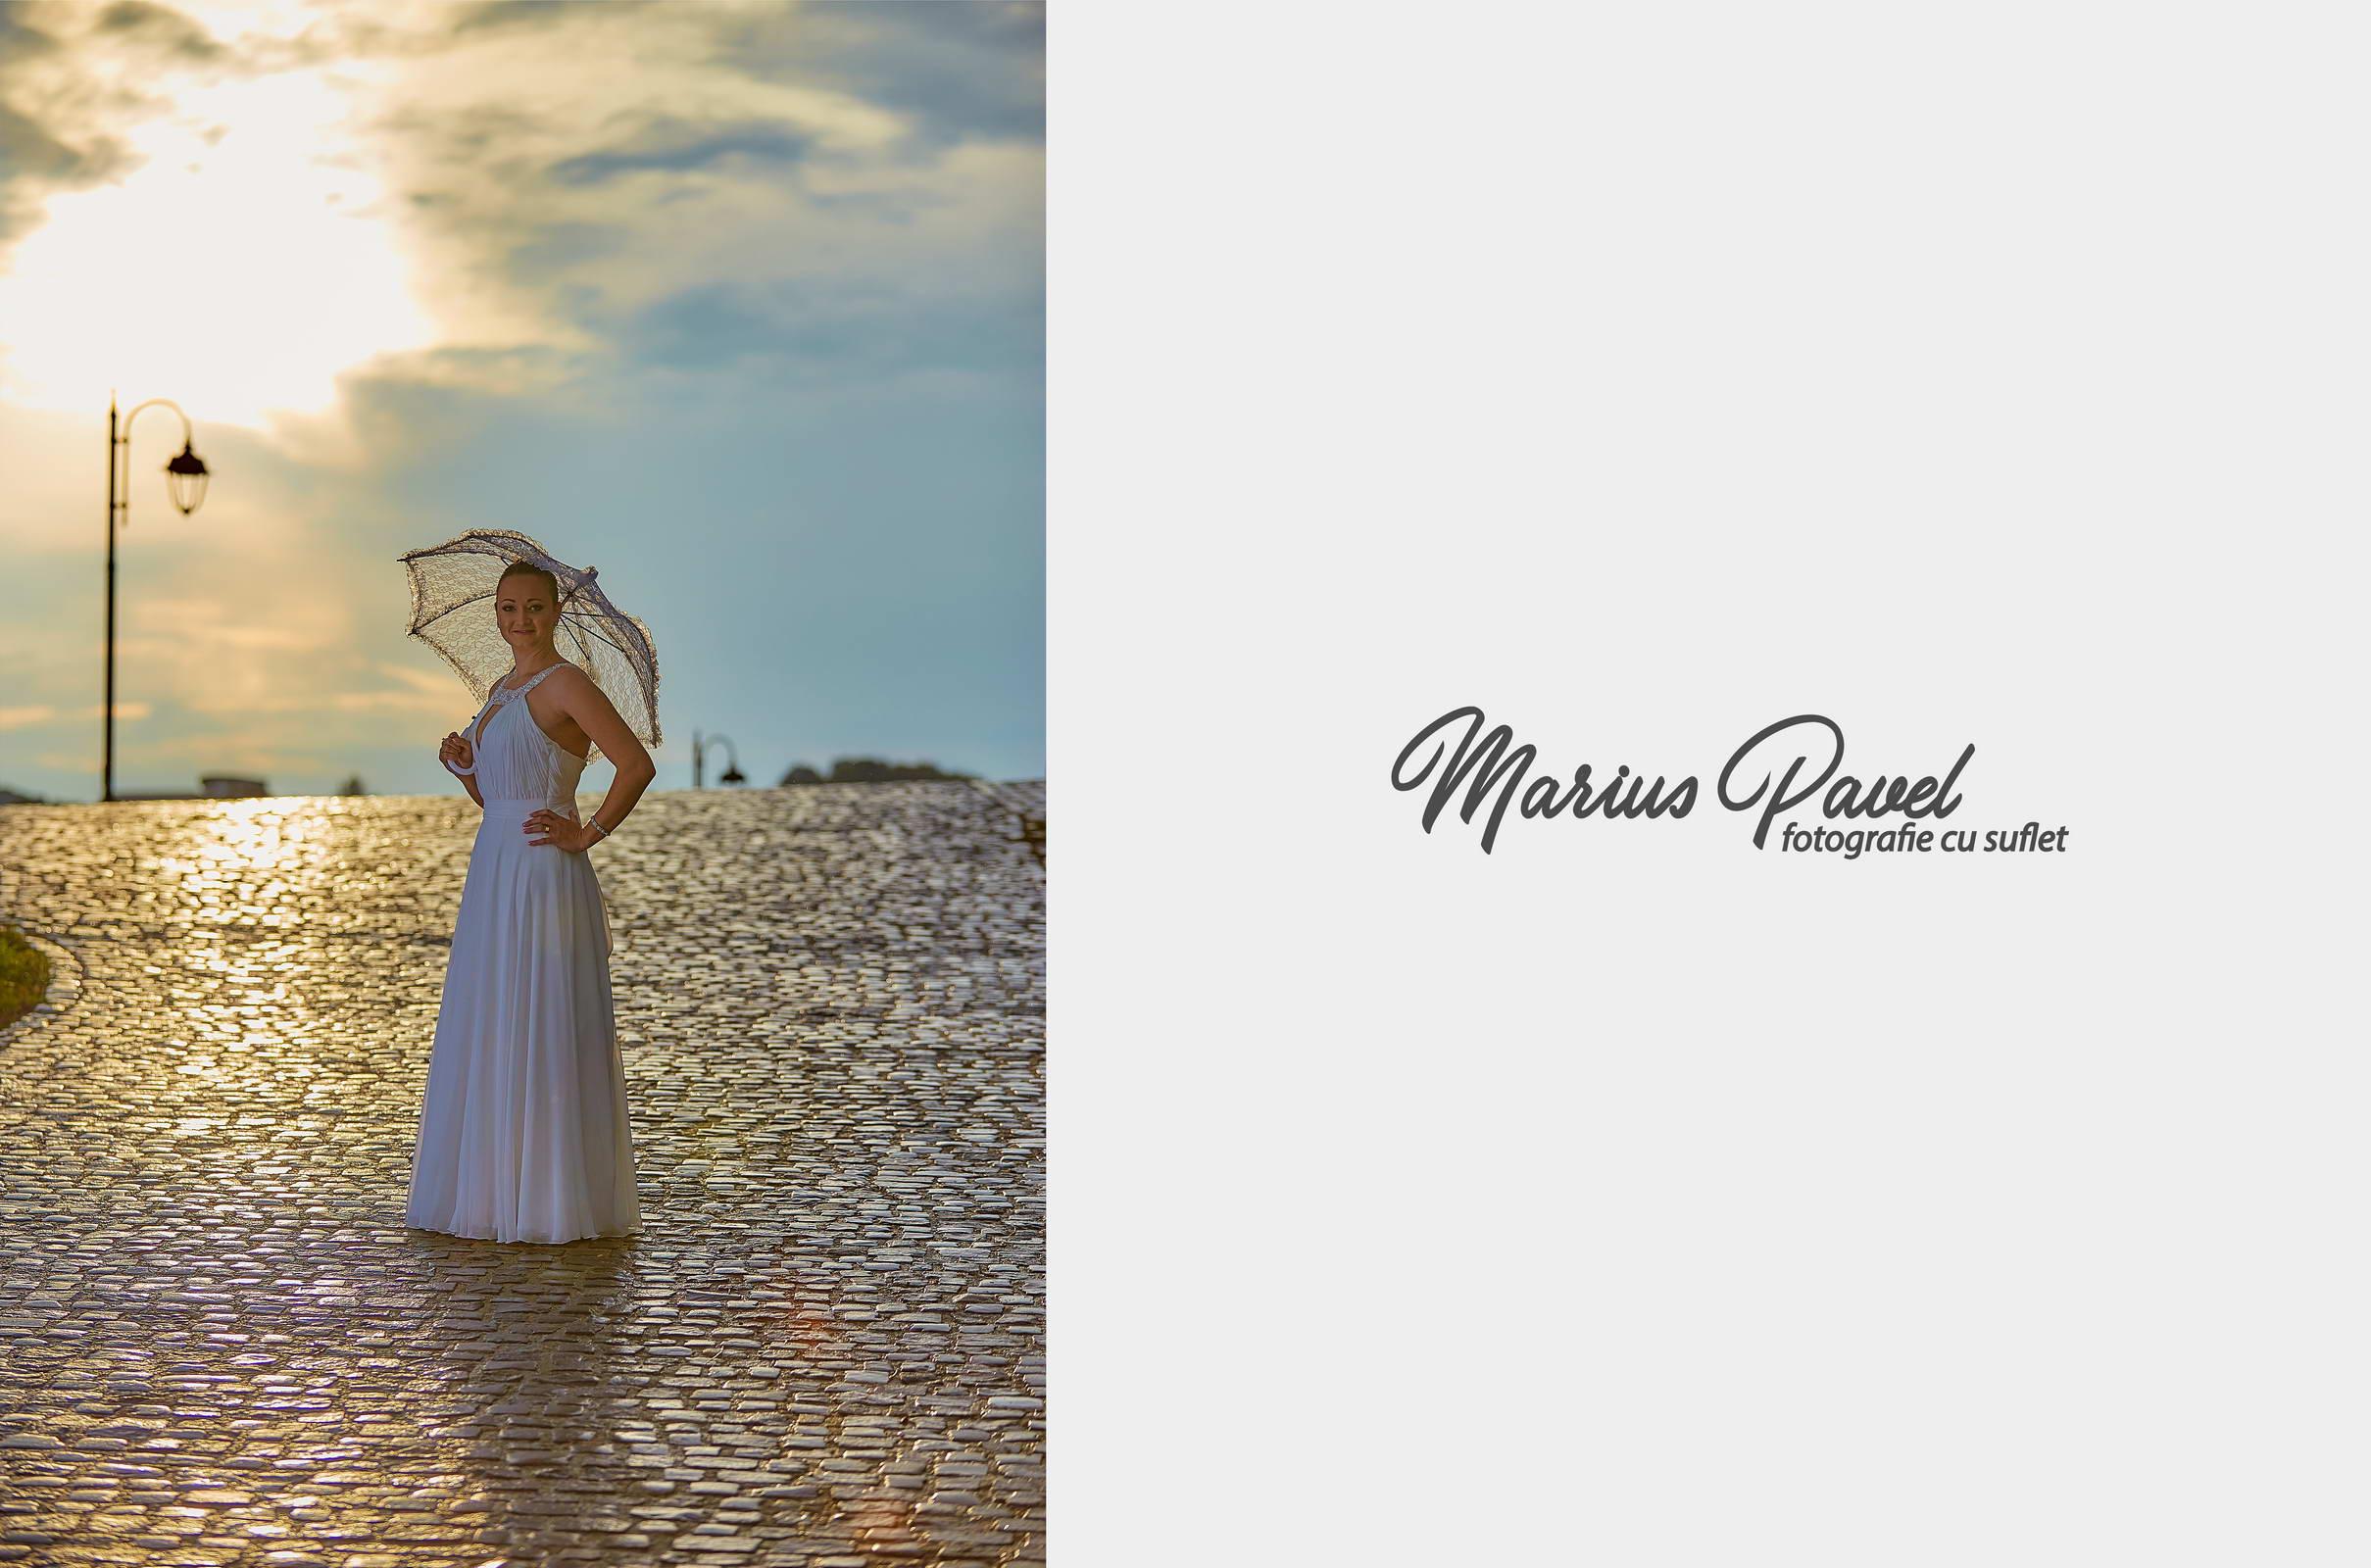 Trash The Dress La Cetatuia Brasov Love The Dress Cu Mirii La Brasov (1)